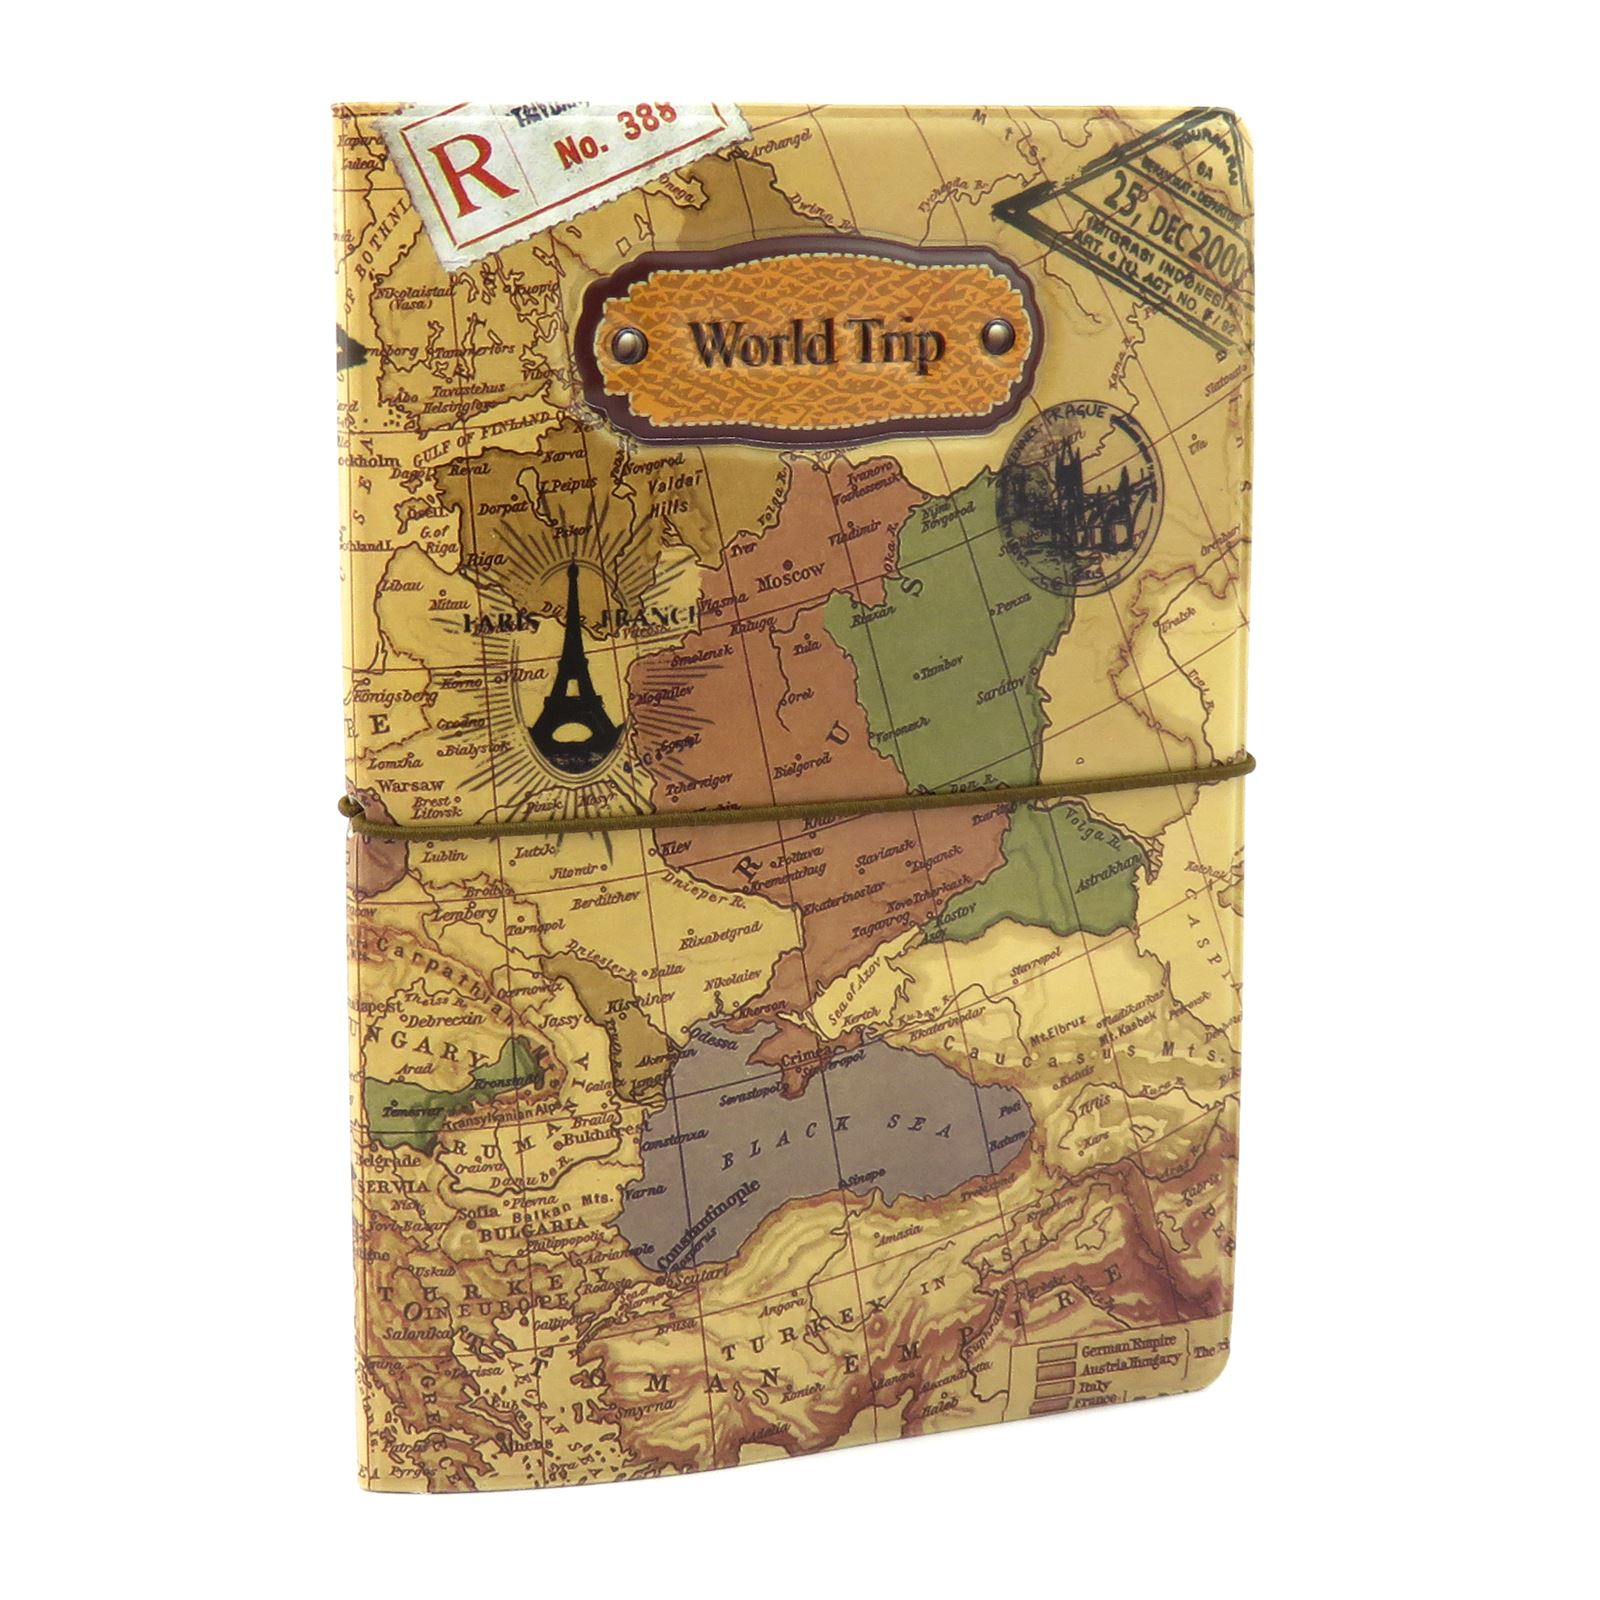 Passport holder wallet case travel world map id ticket receipt porta pasaporte billetera estuche de viaje organizador de gumiabroncs Images